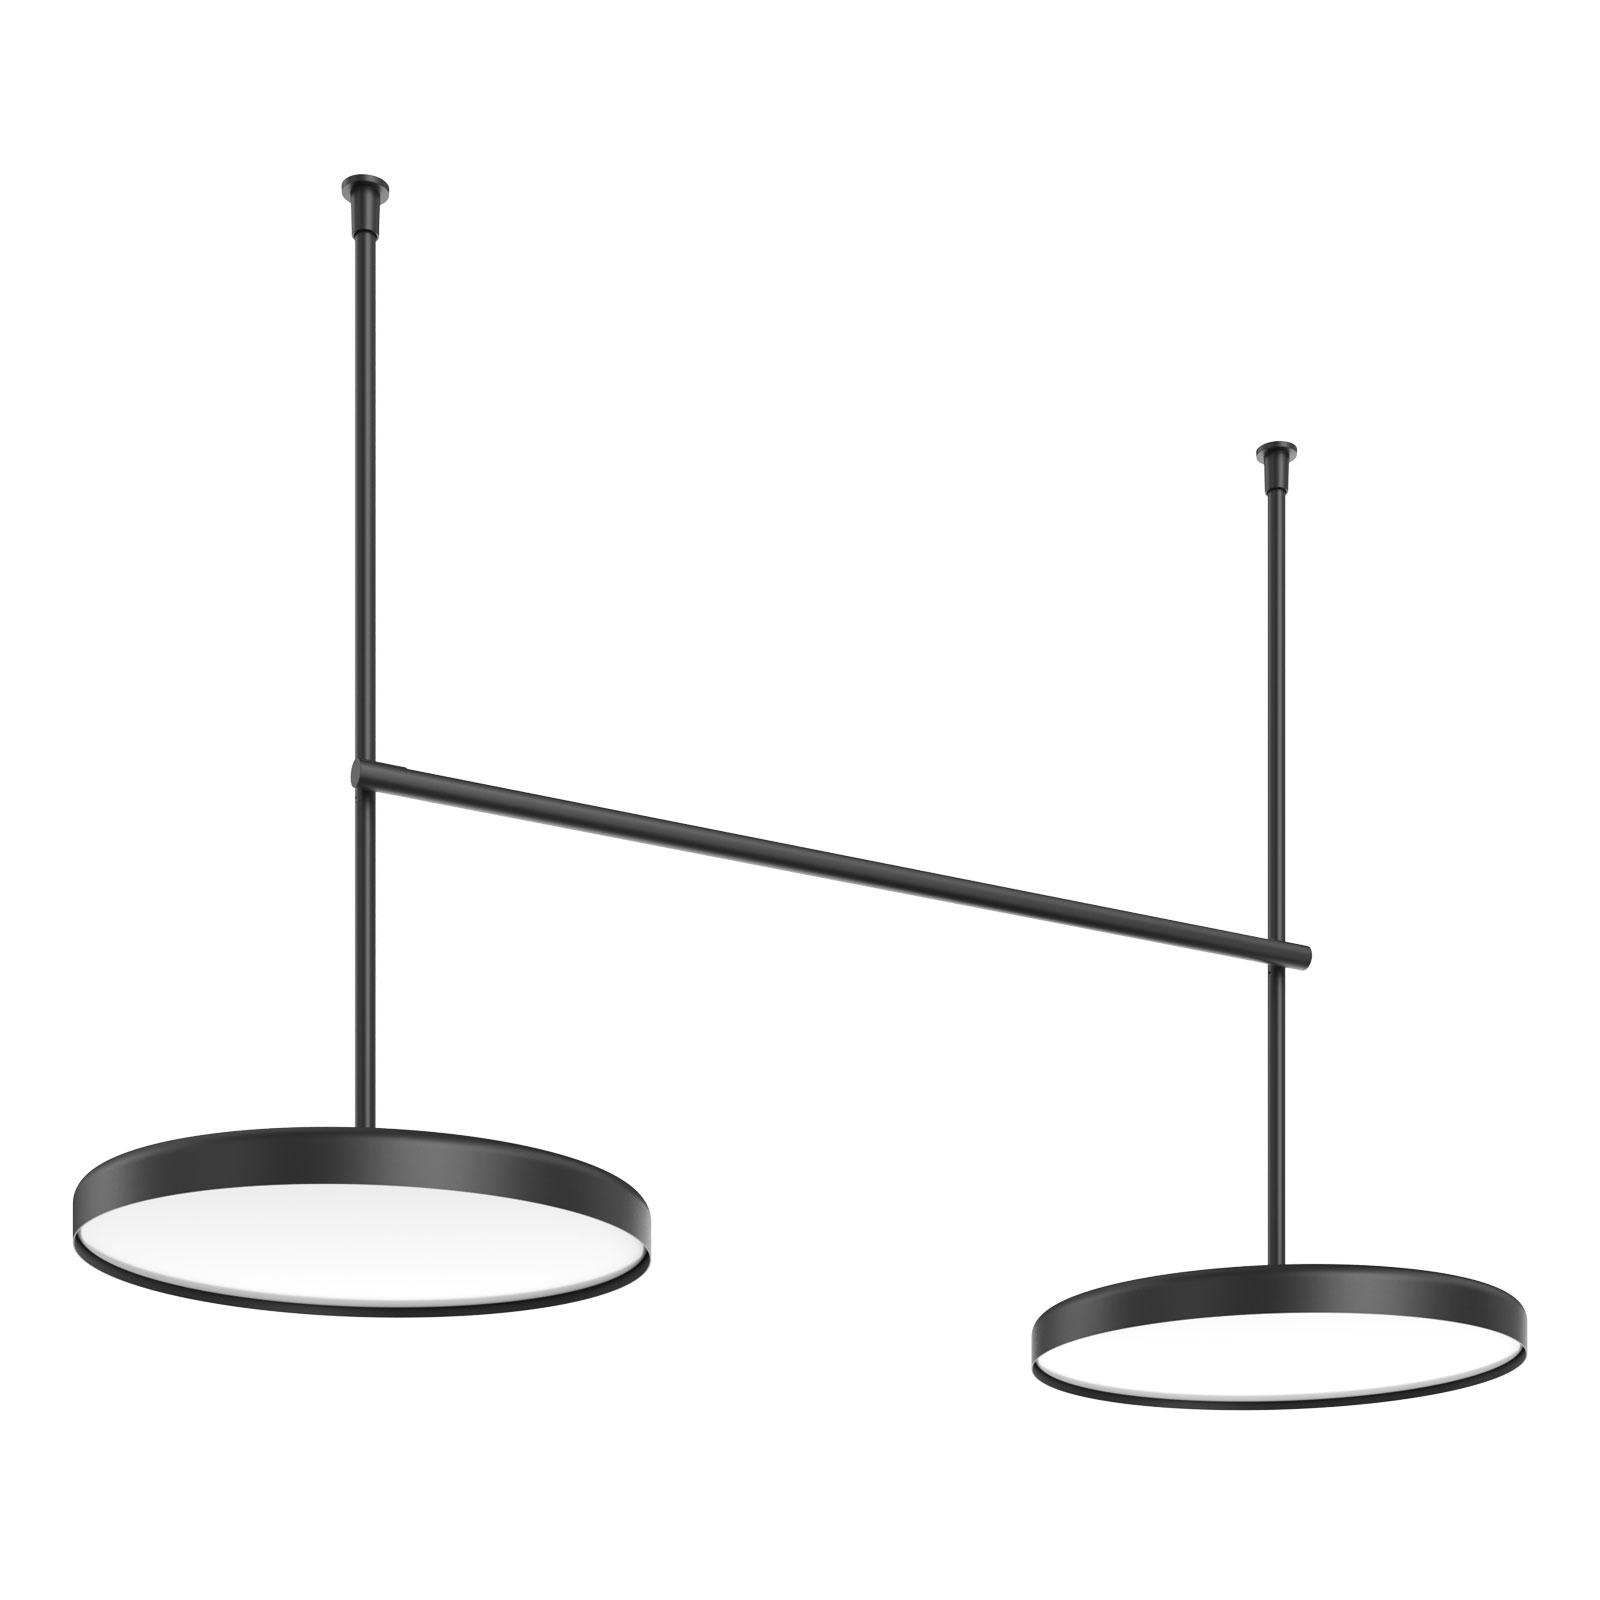 FLOS Infra-Structure C4 -LED-kattovalaisin, musta